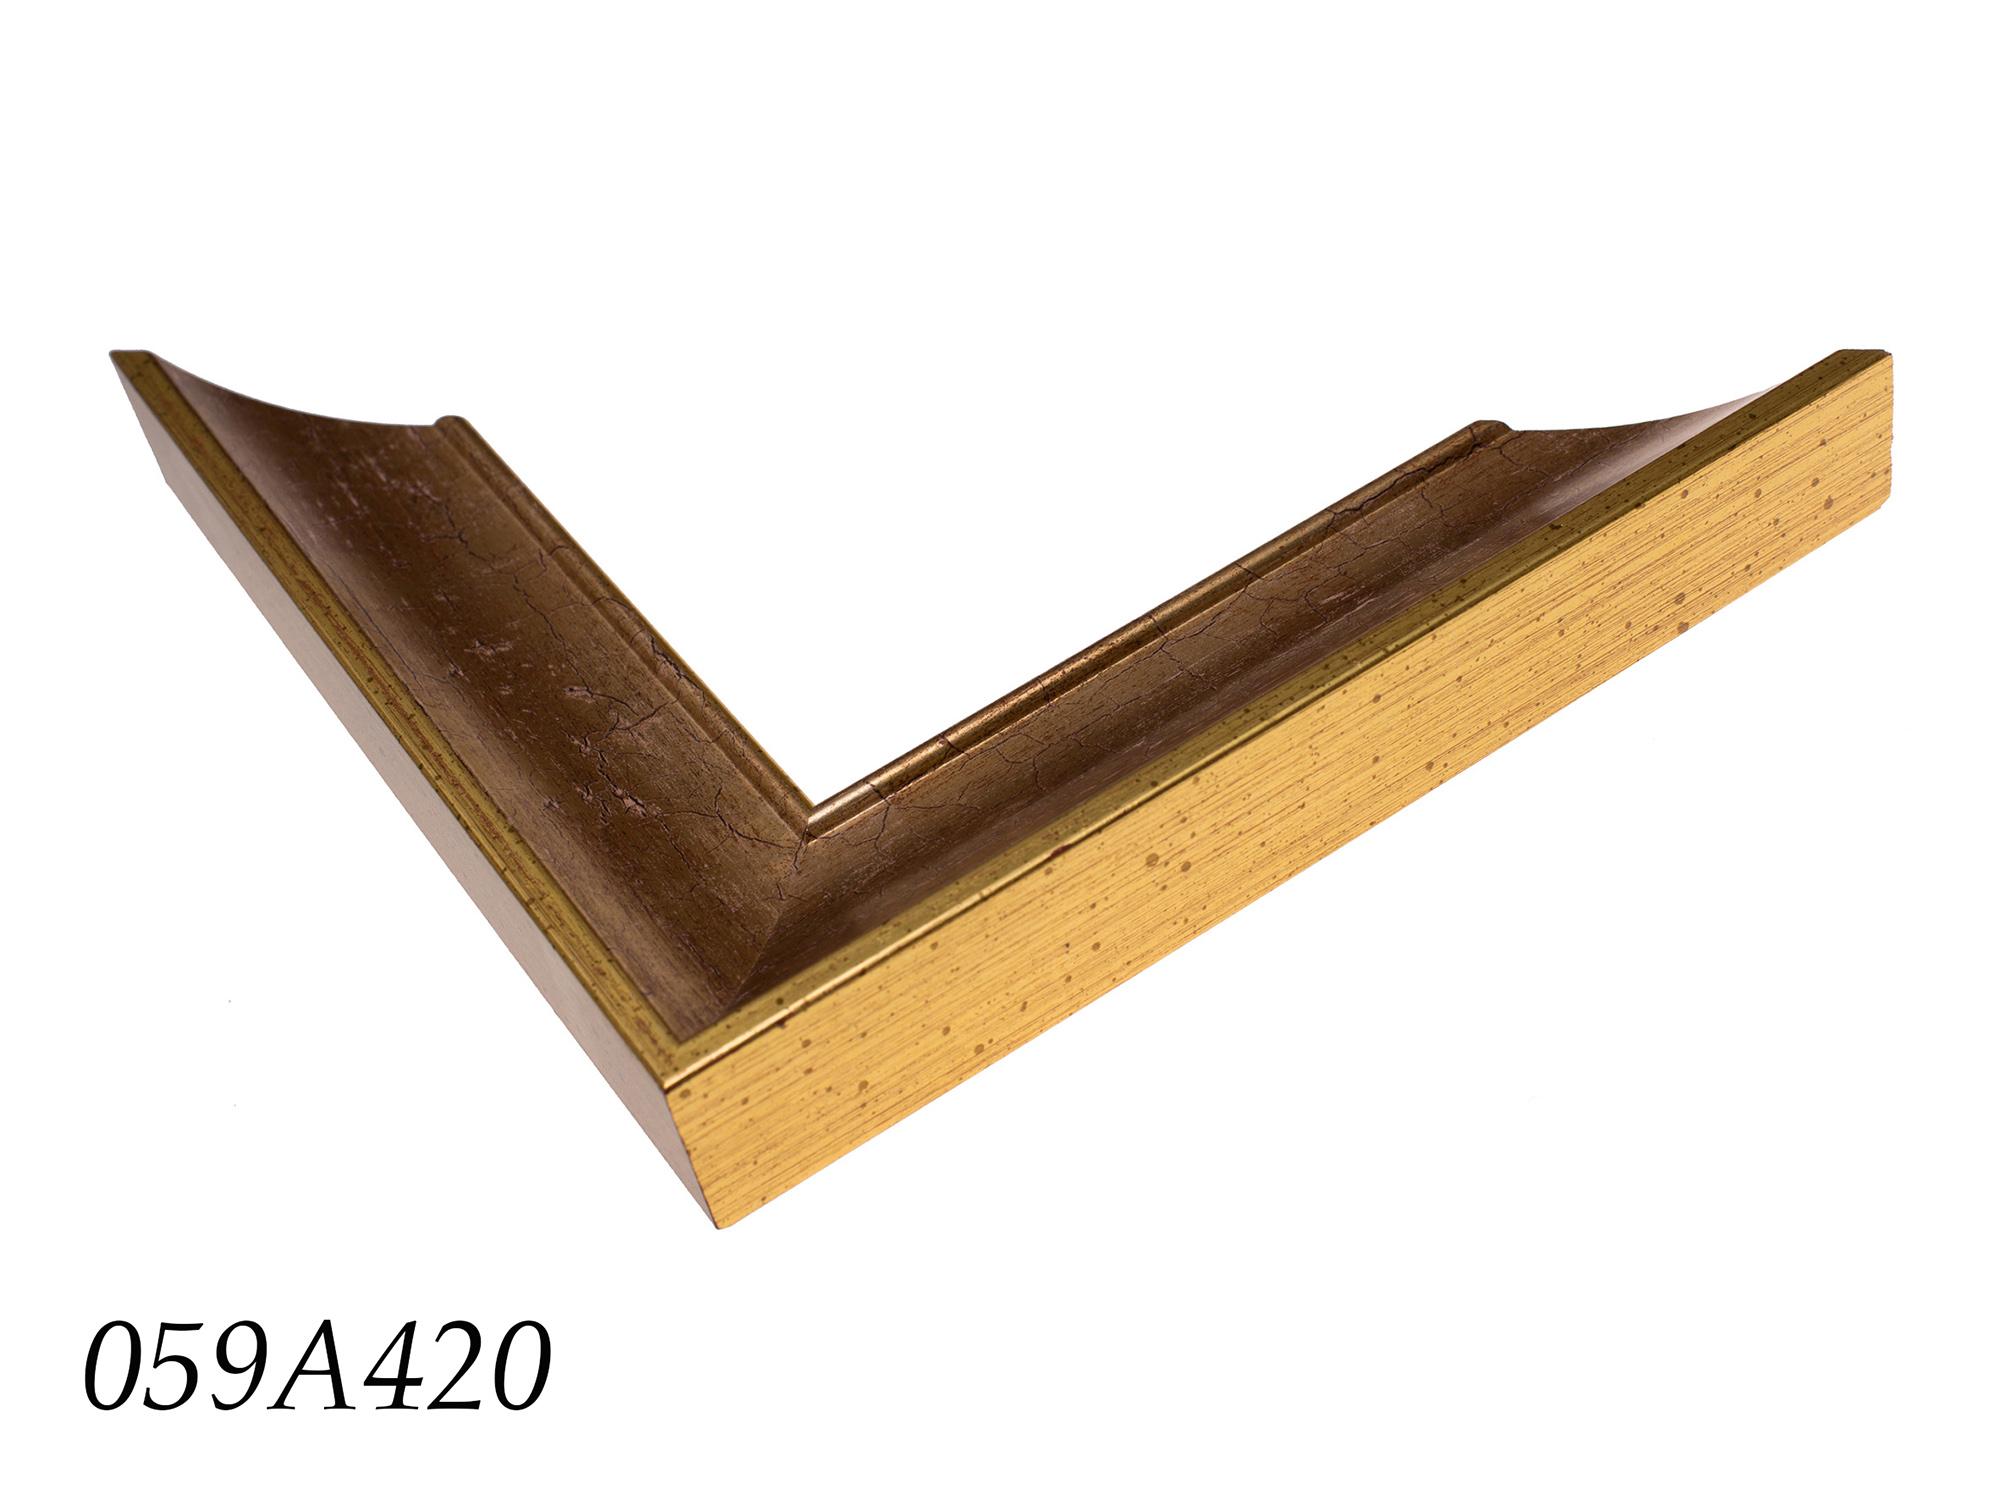 059A420